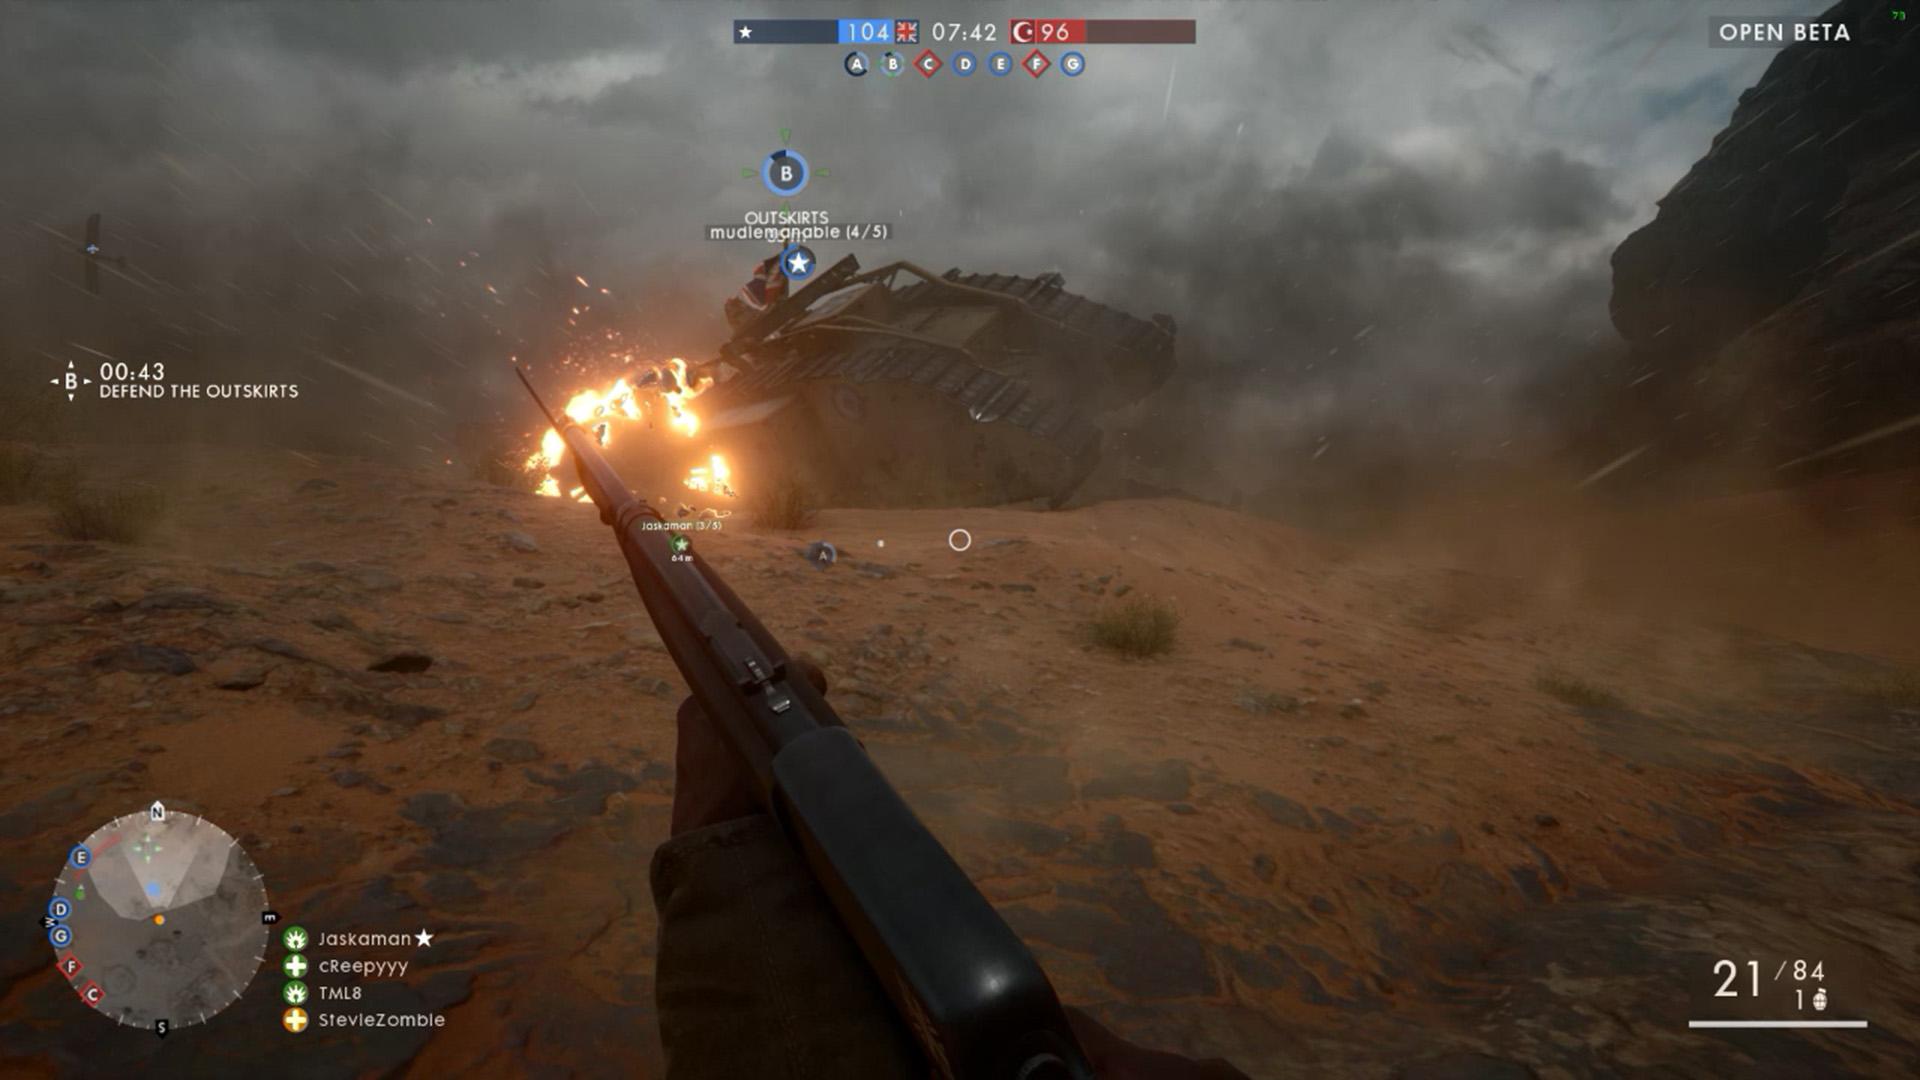 Battlefield 1 beta 02